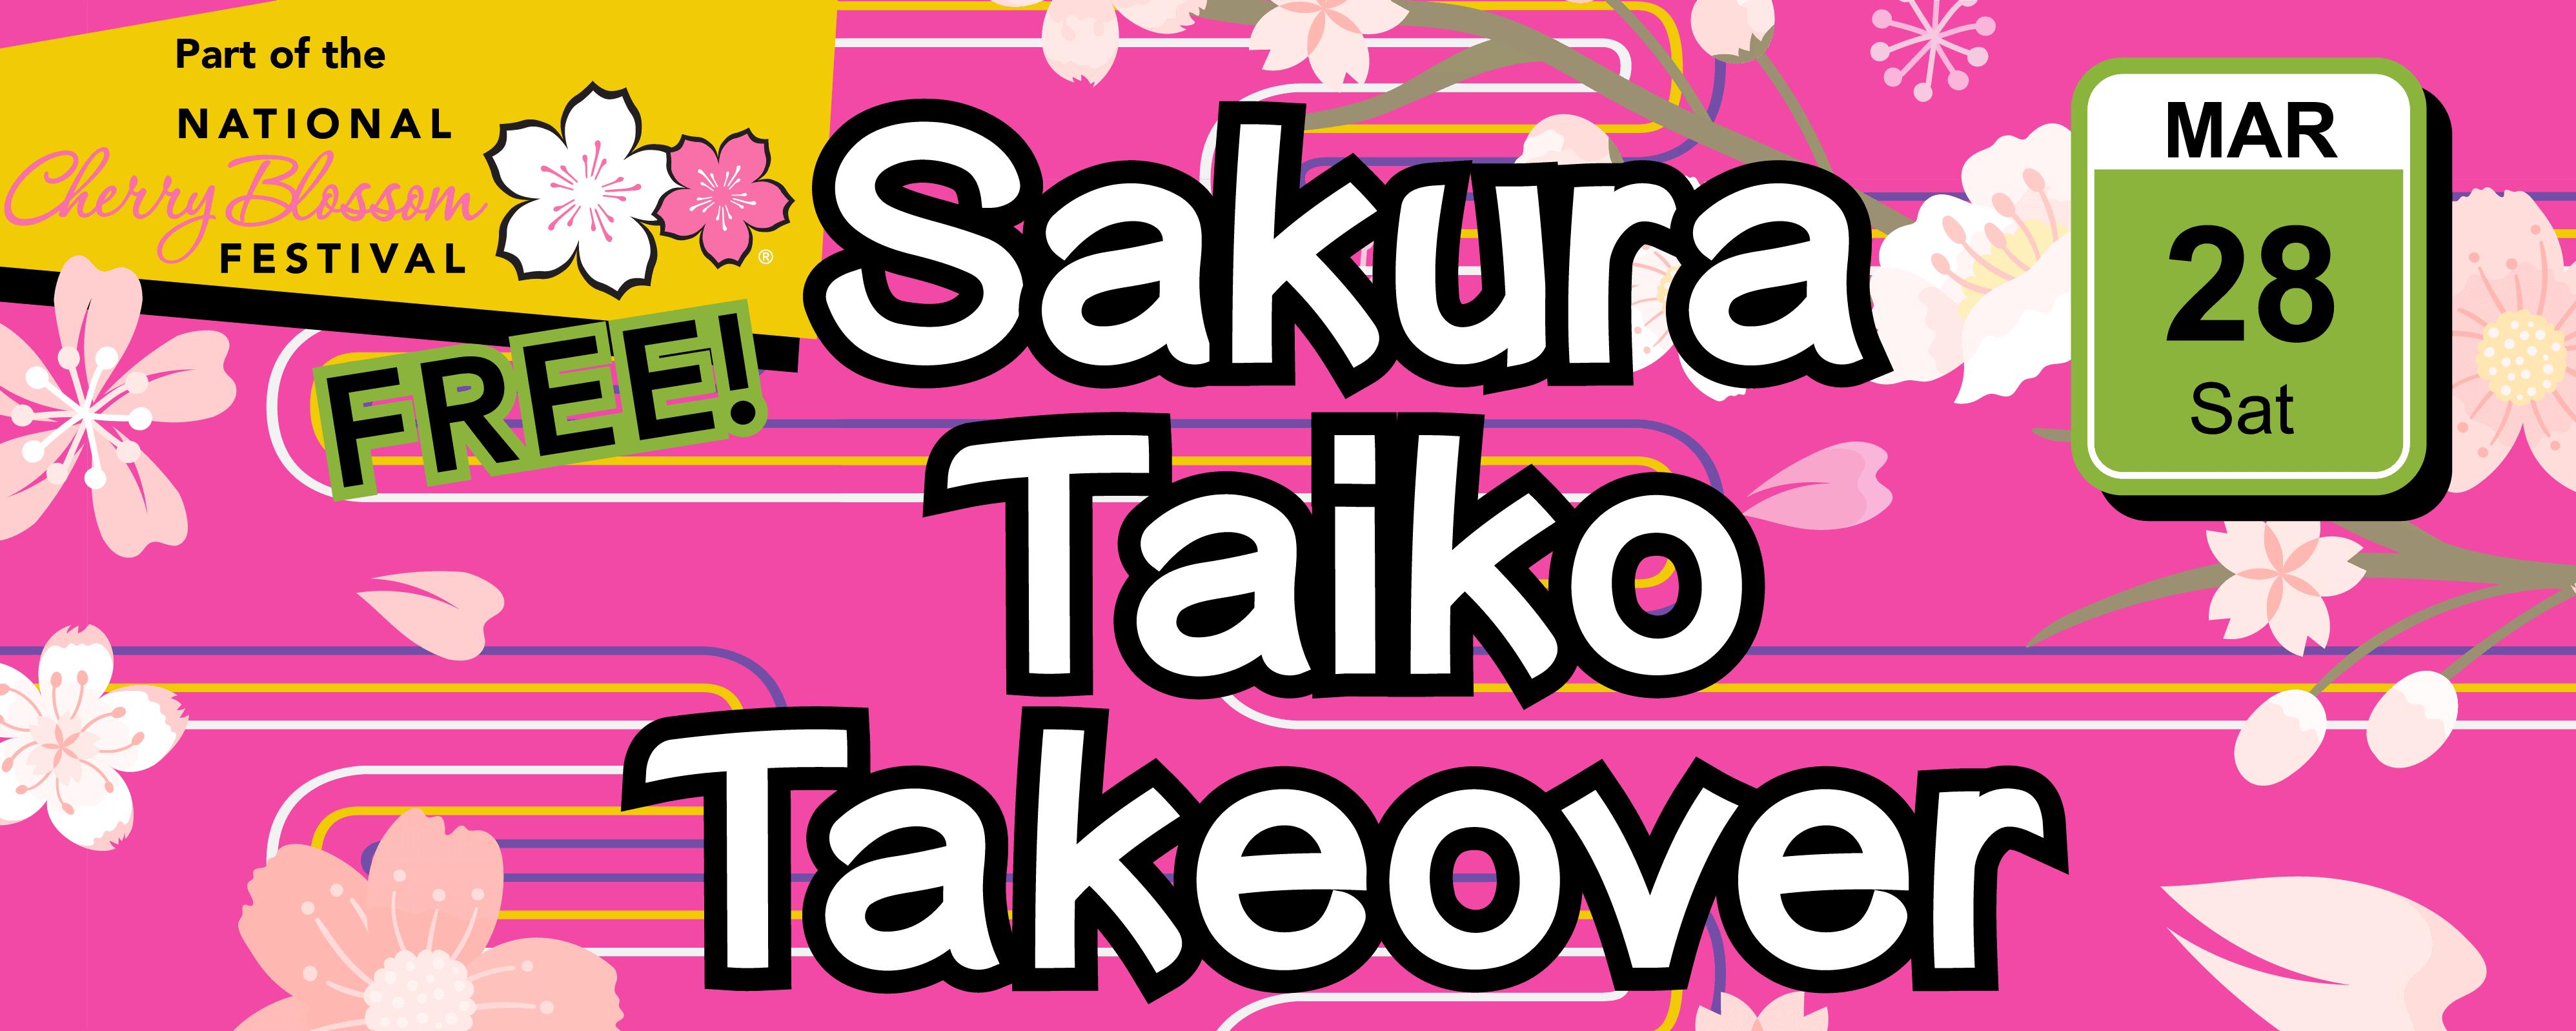 Sakura Taiko Takeover mobile banner